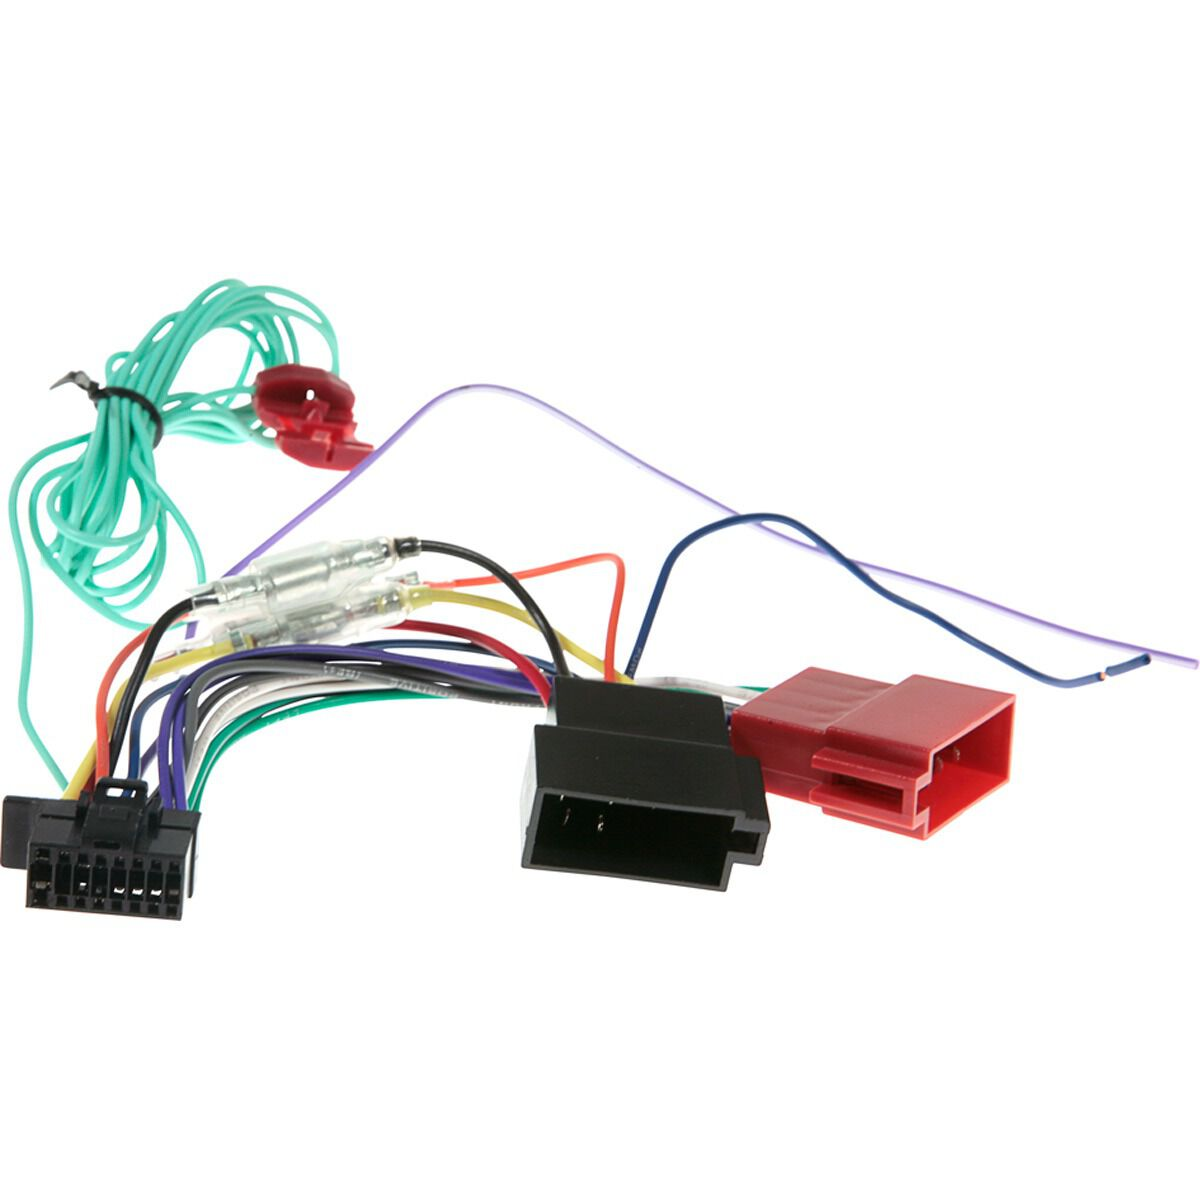 nissan pulsar n15 radio wiring diagram automatic bilge pump harnesses supercheap auto australia harness iso to son